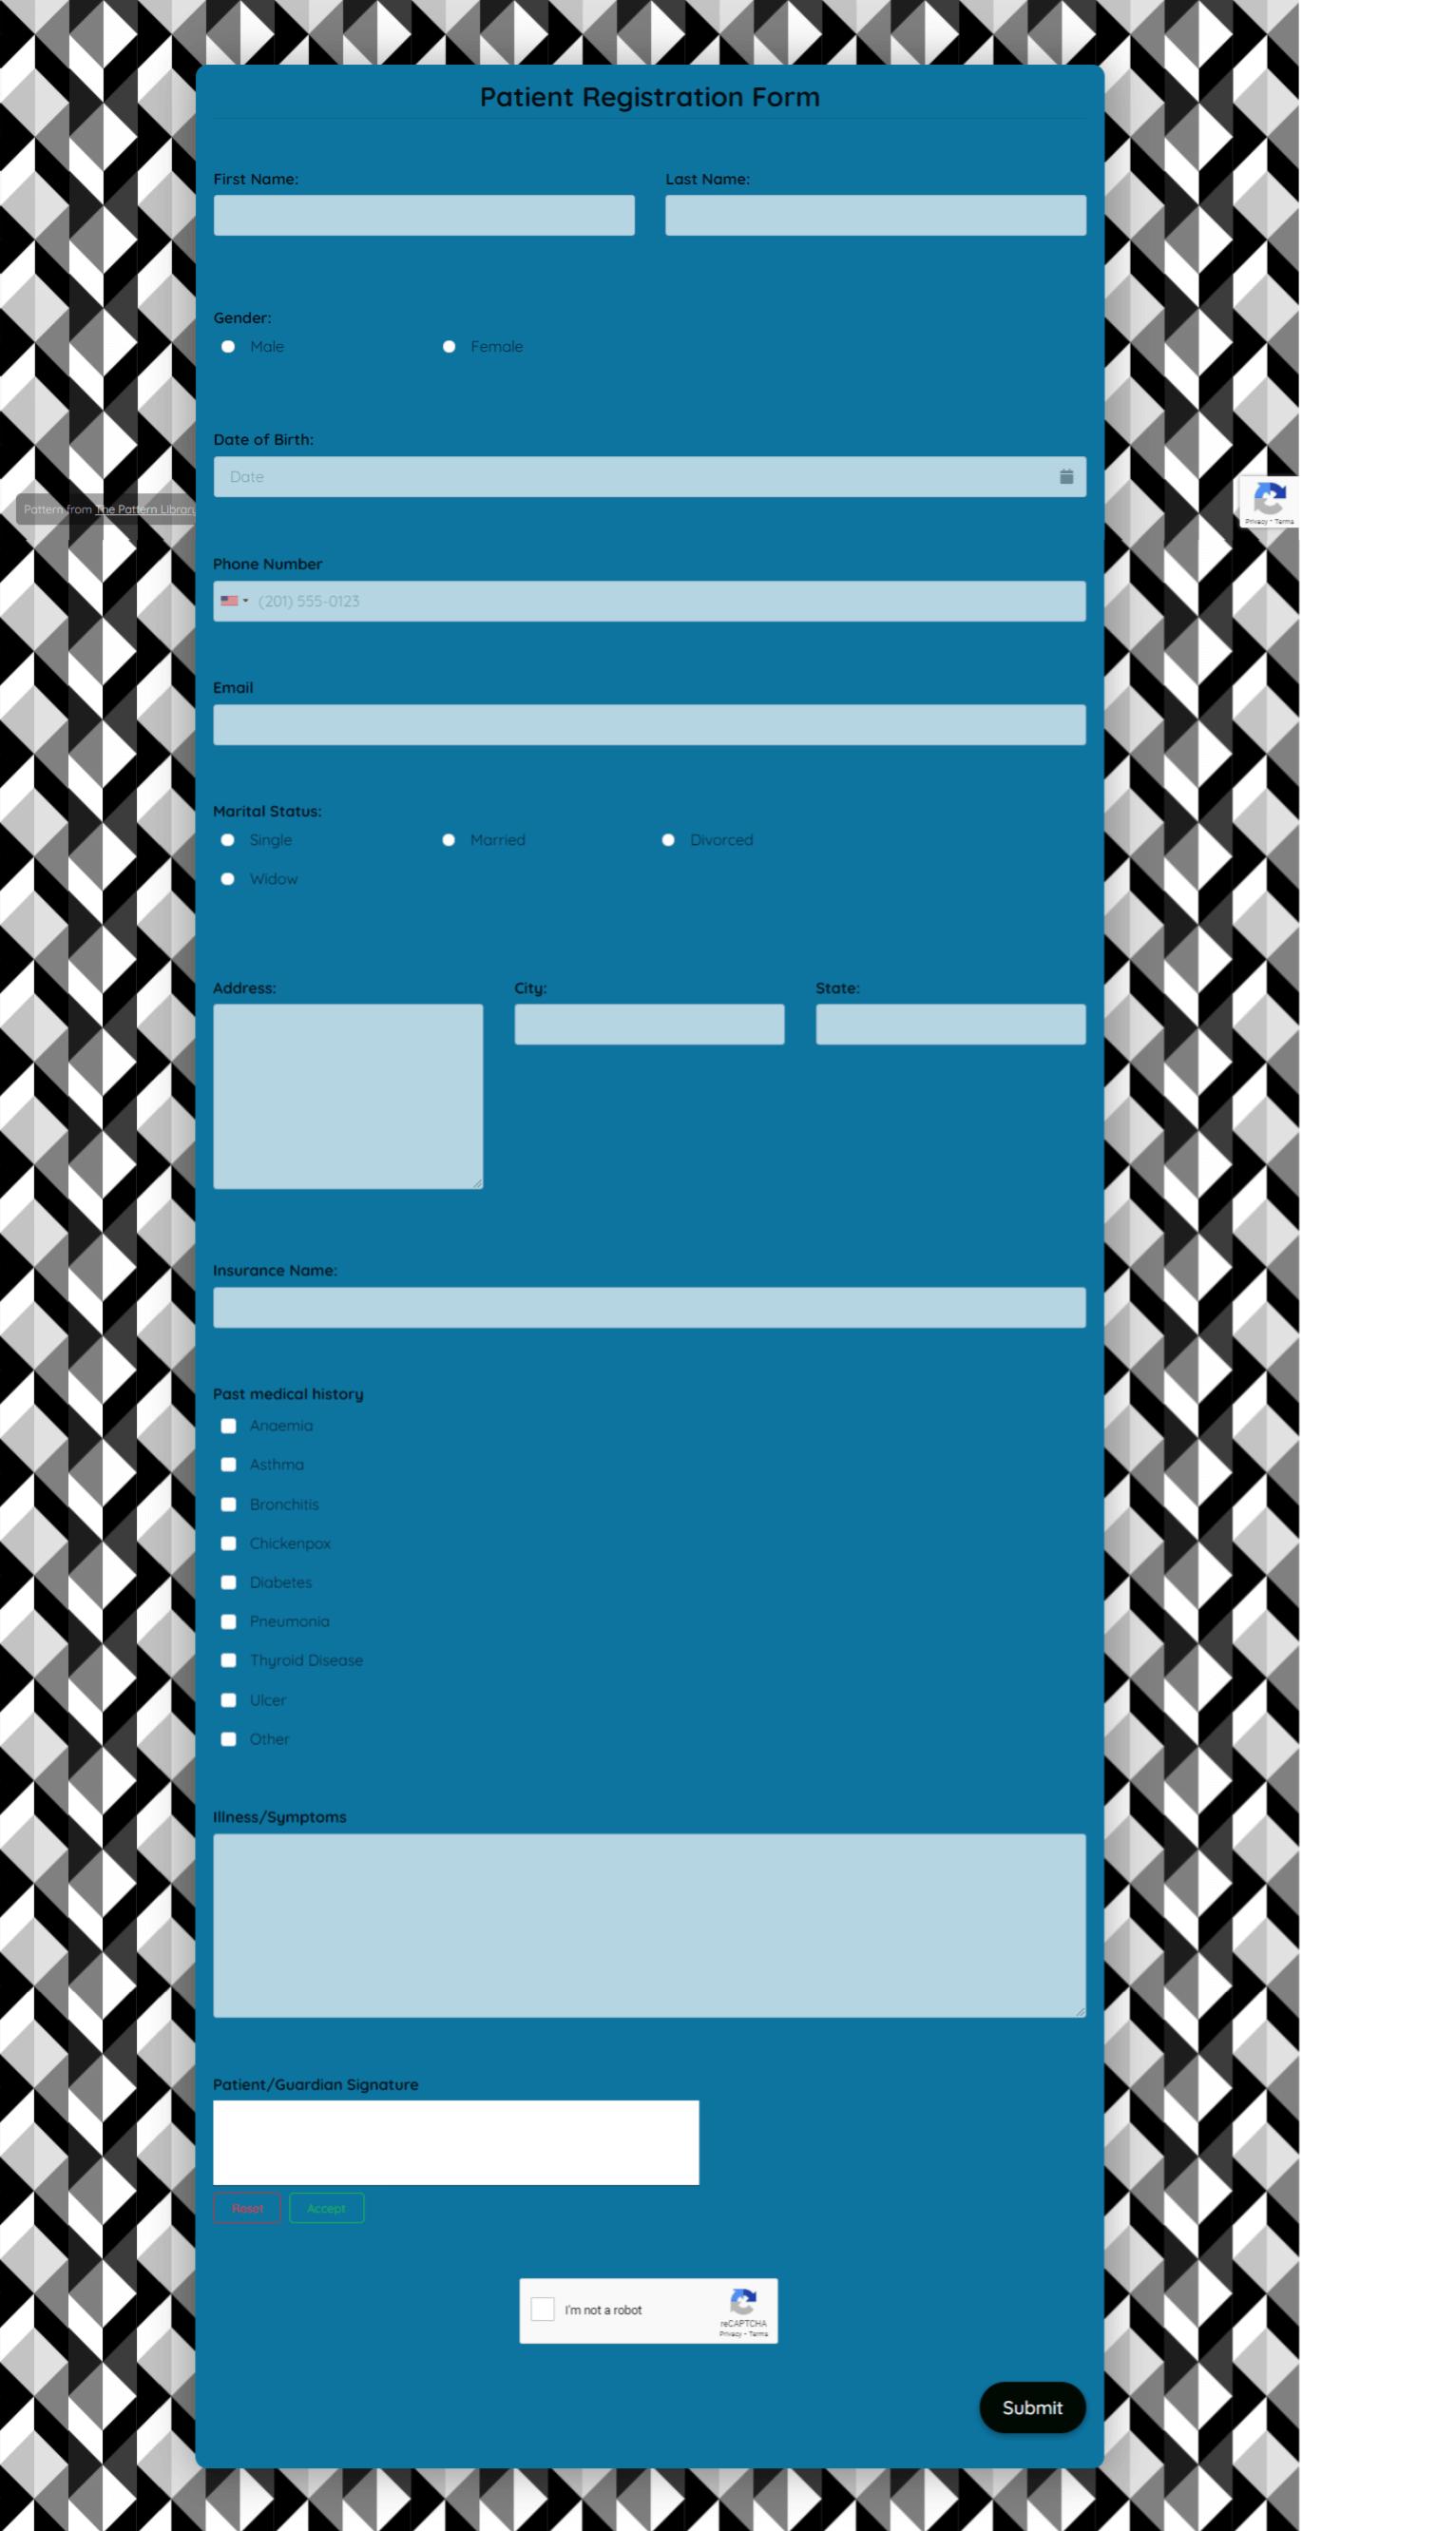 Patient Registration Form Template template